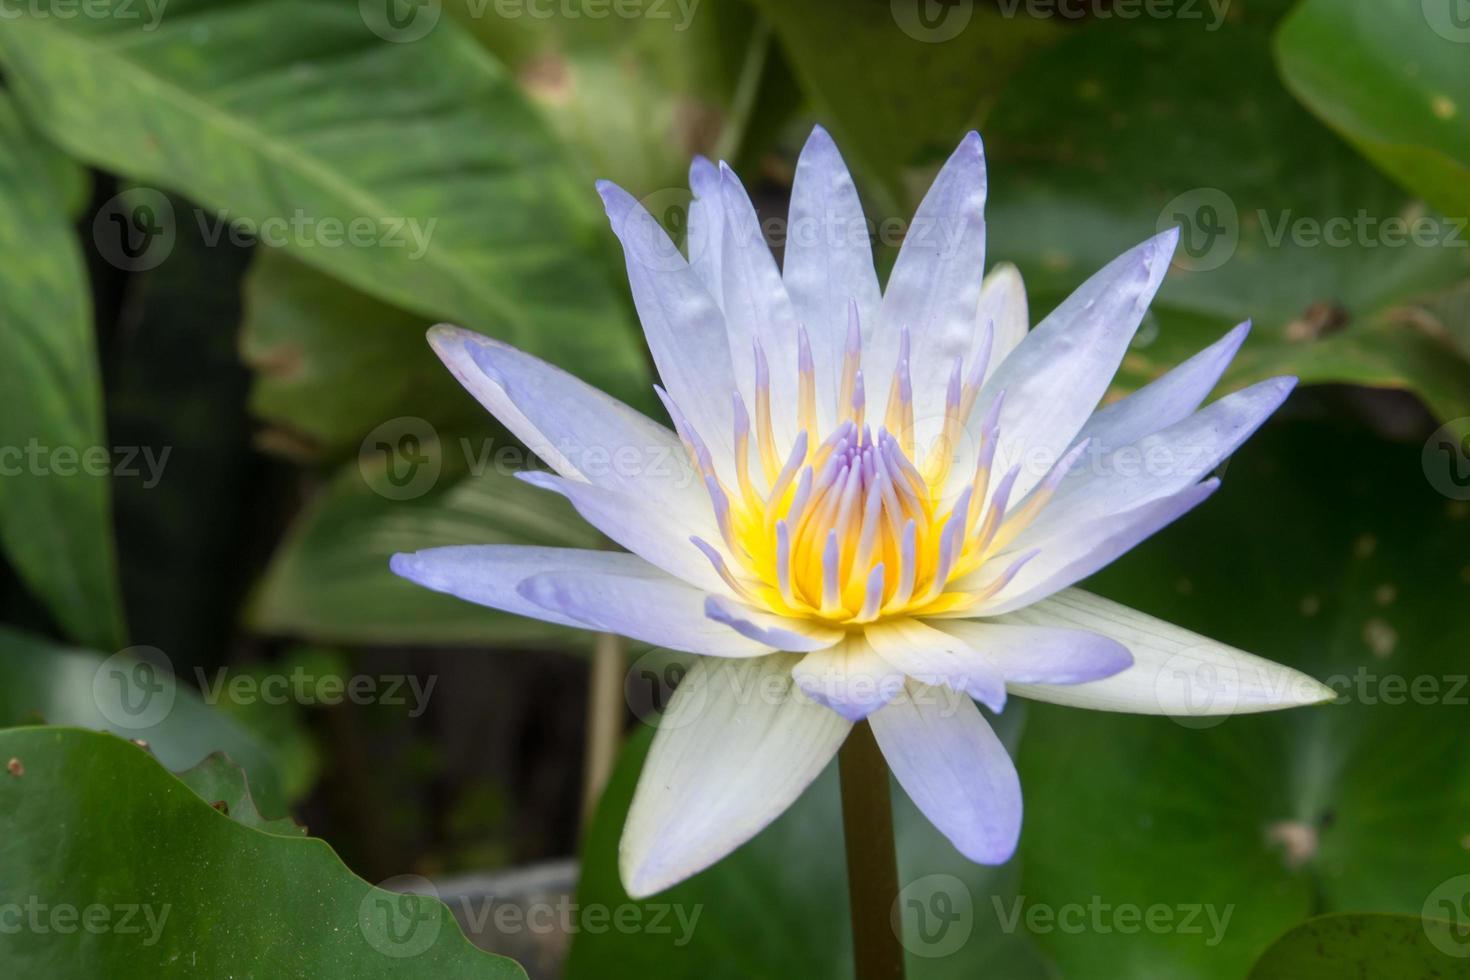 flor de loto en el agua foto